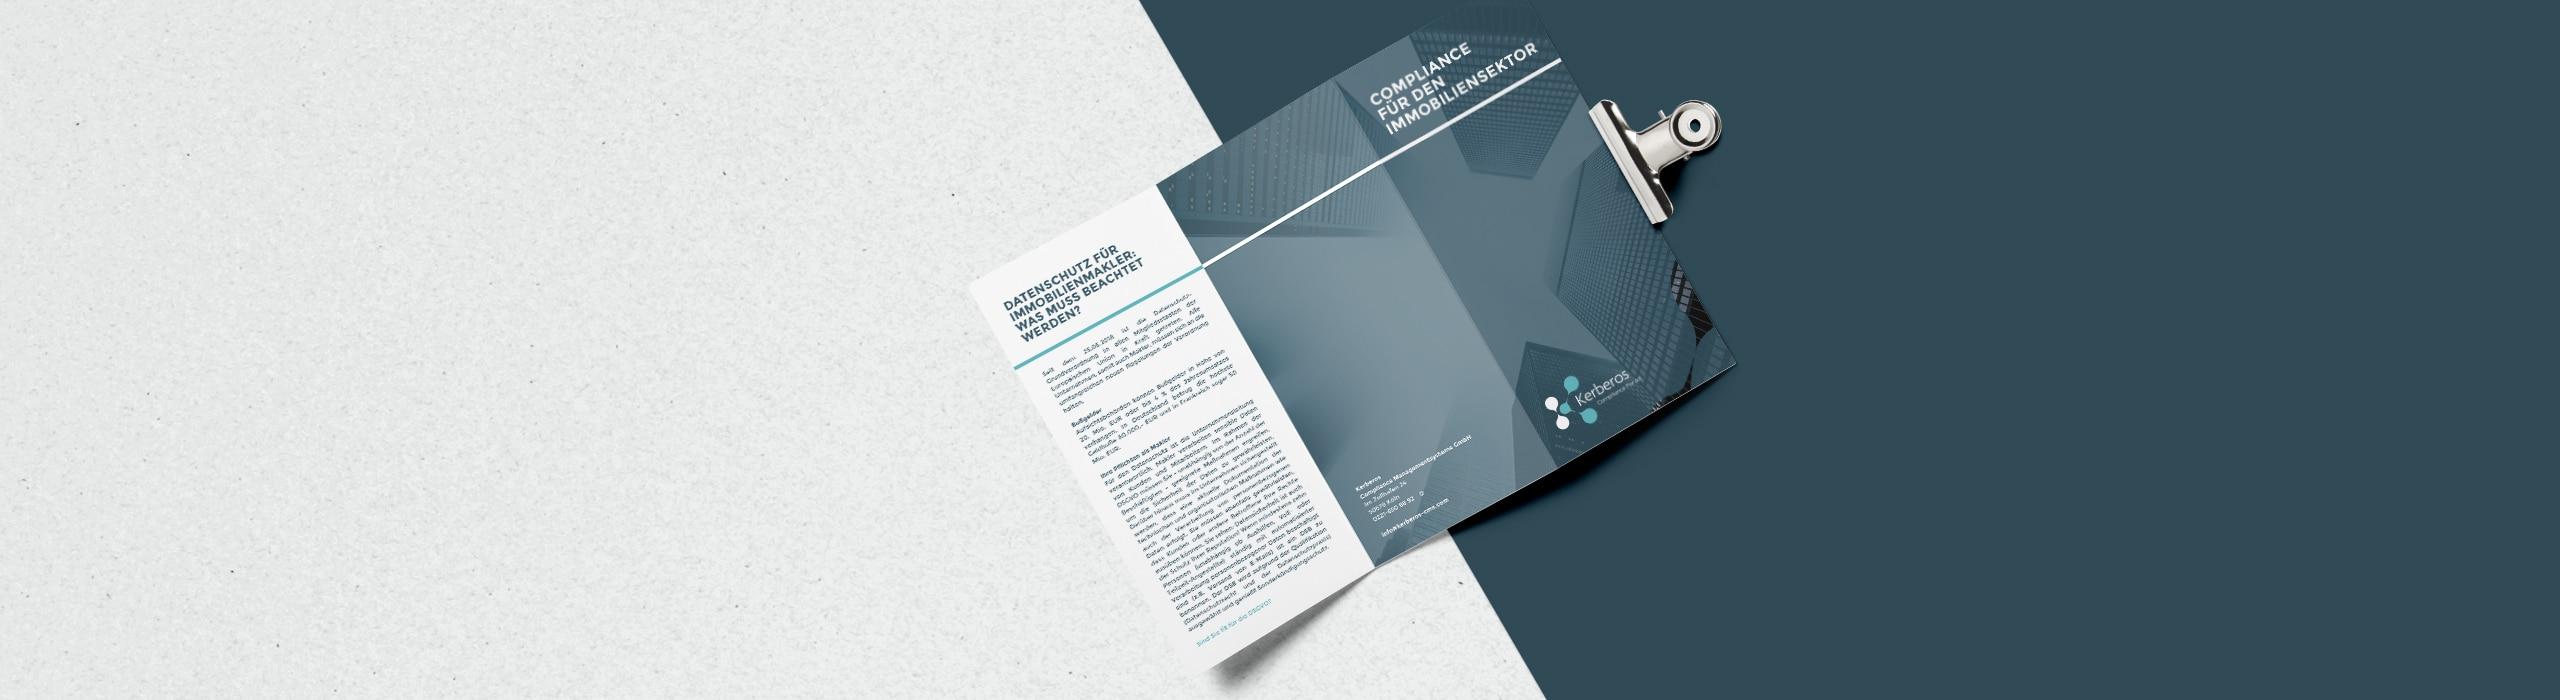 Kerberos - Trifold-2 - Natie Branding Agency